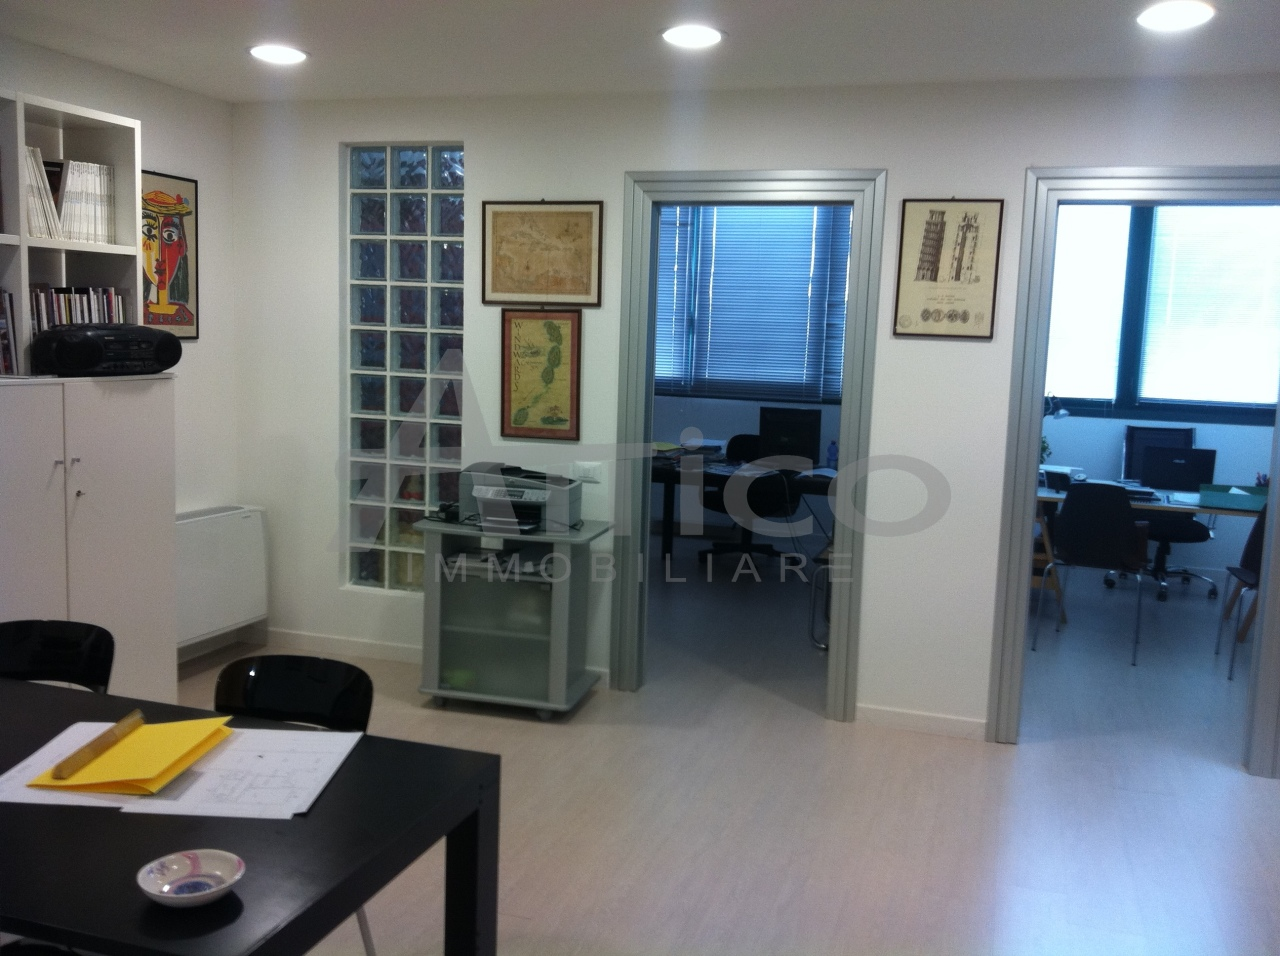 Ufficio a Area Tosi, Rovigo